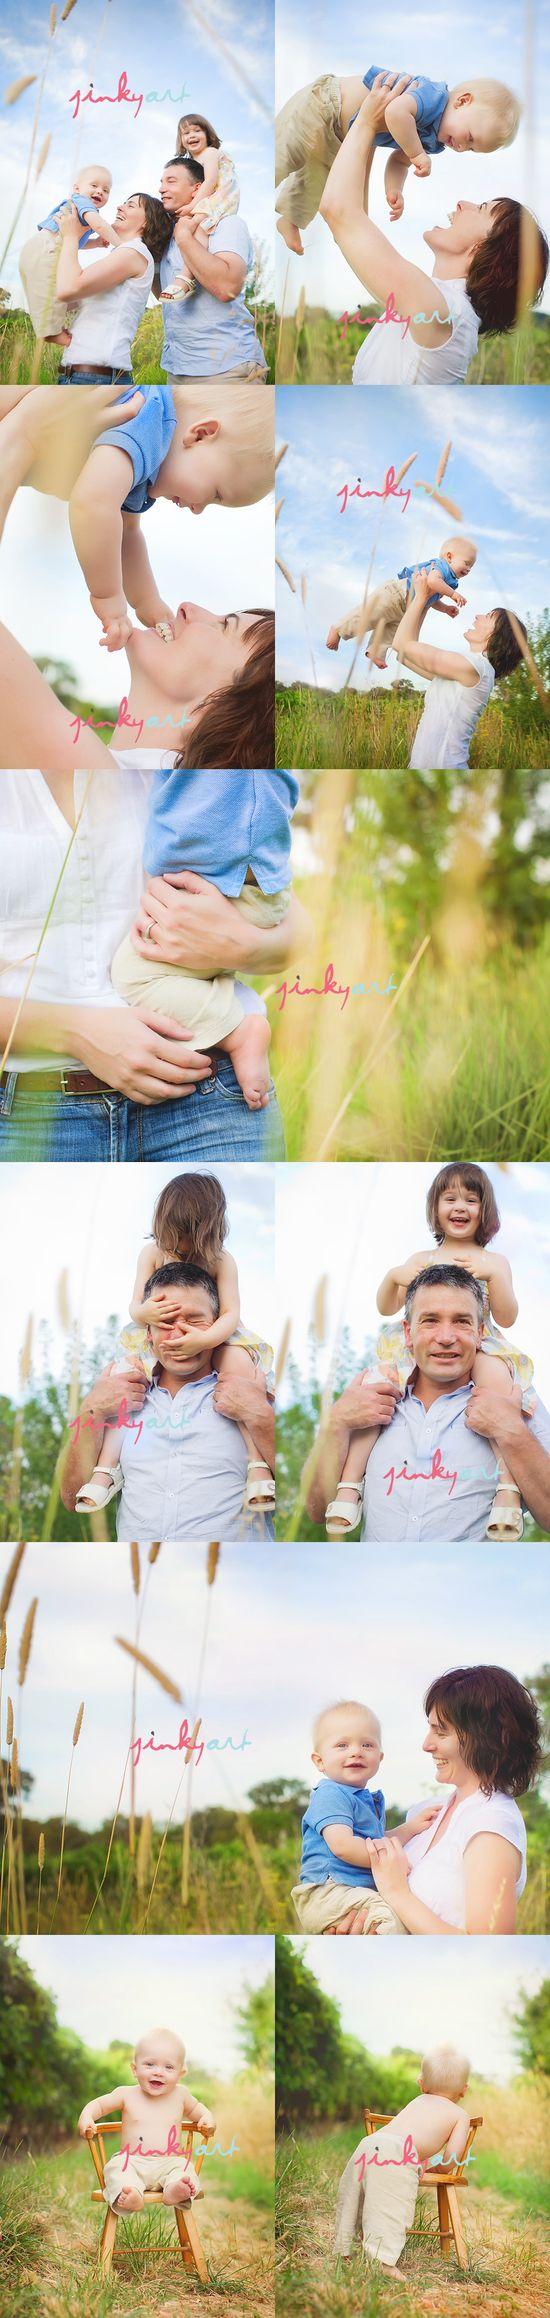 Cool photo shoots creative photo backdrop ideas for Creative family photo shoots